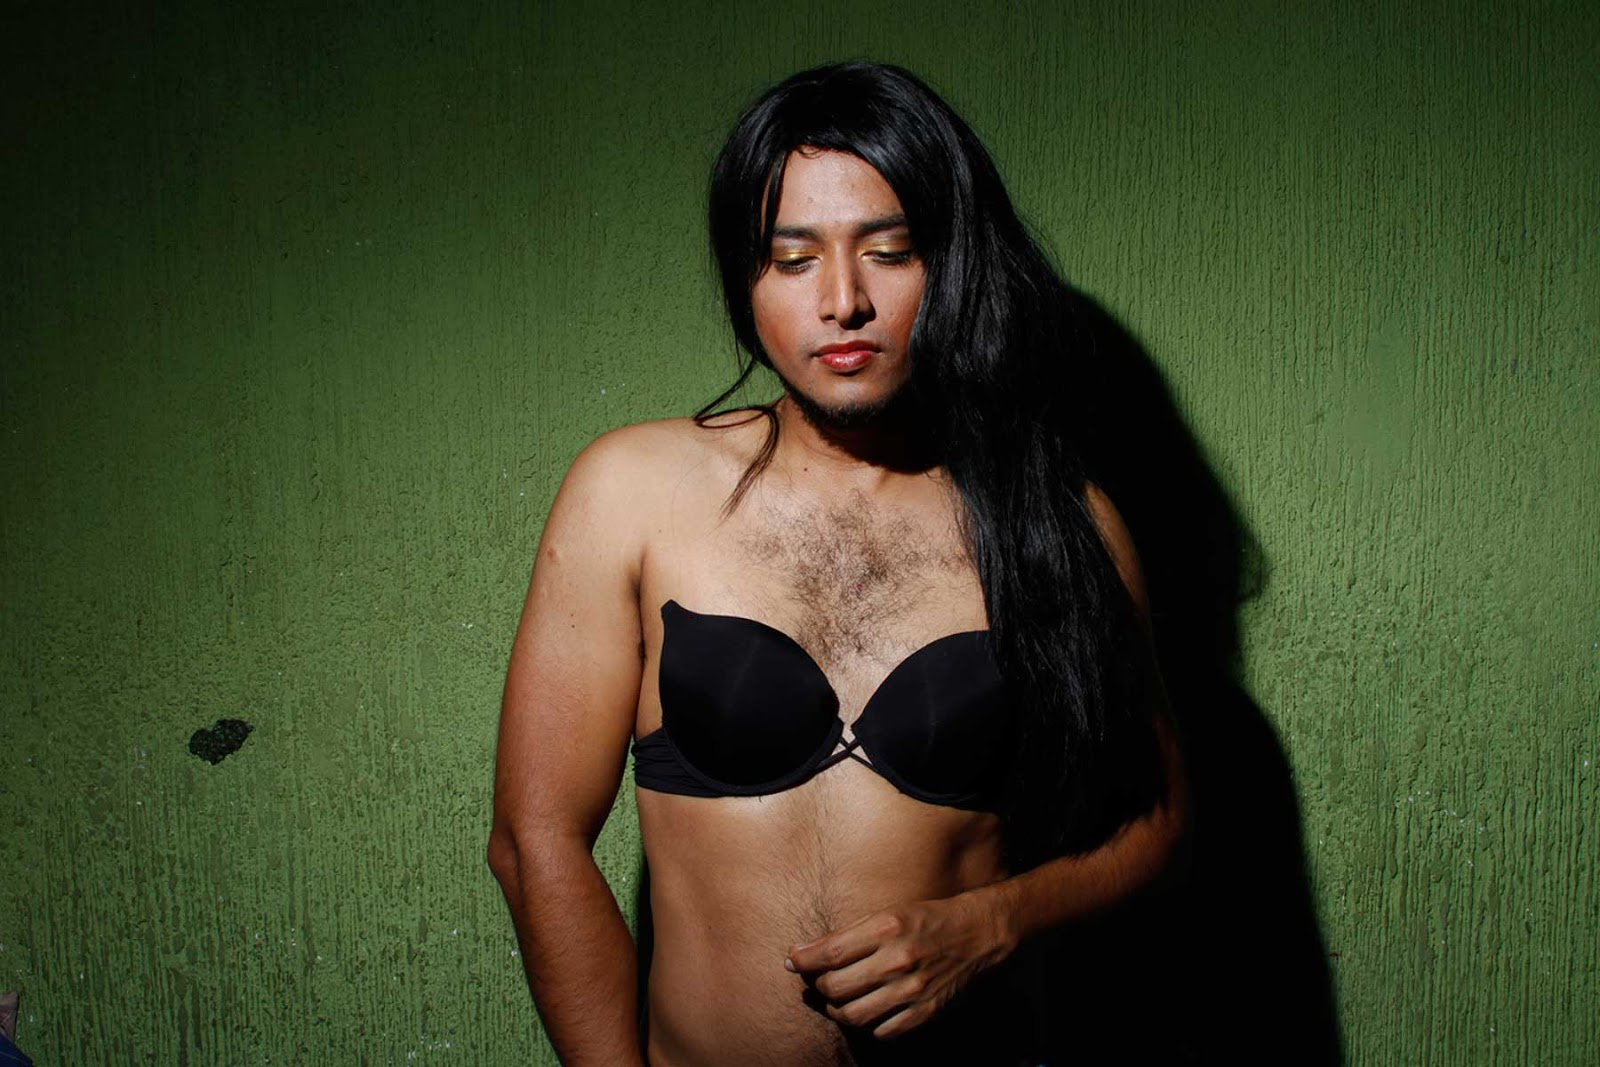 La feminidad para un travesti masculino